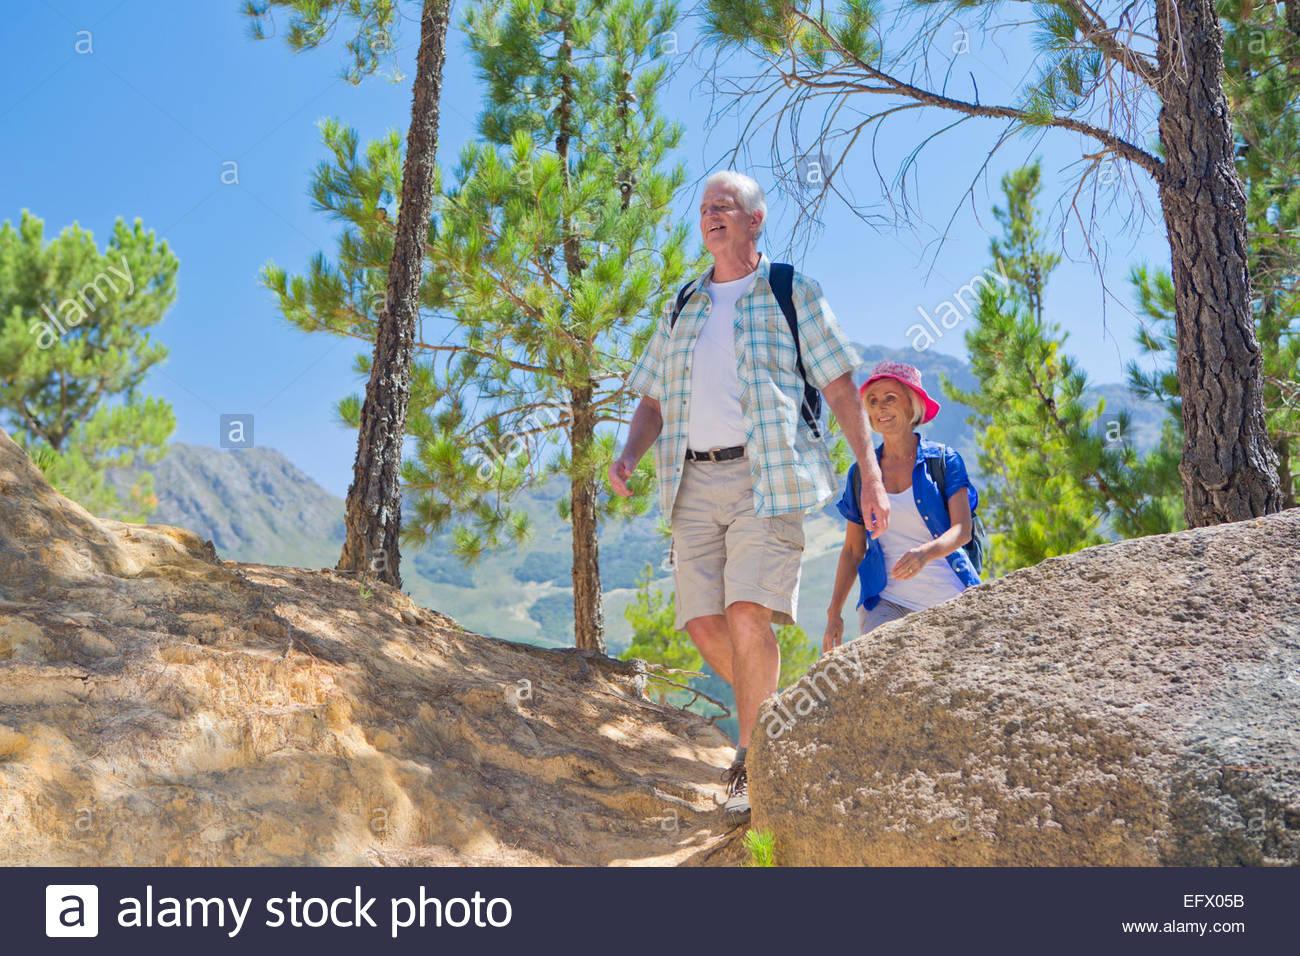 Senior couple hiking on mountain path - Stock Image